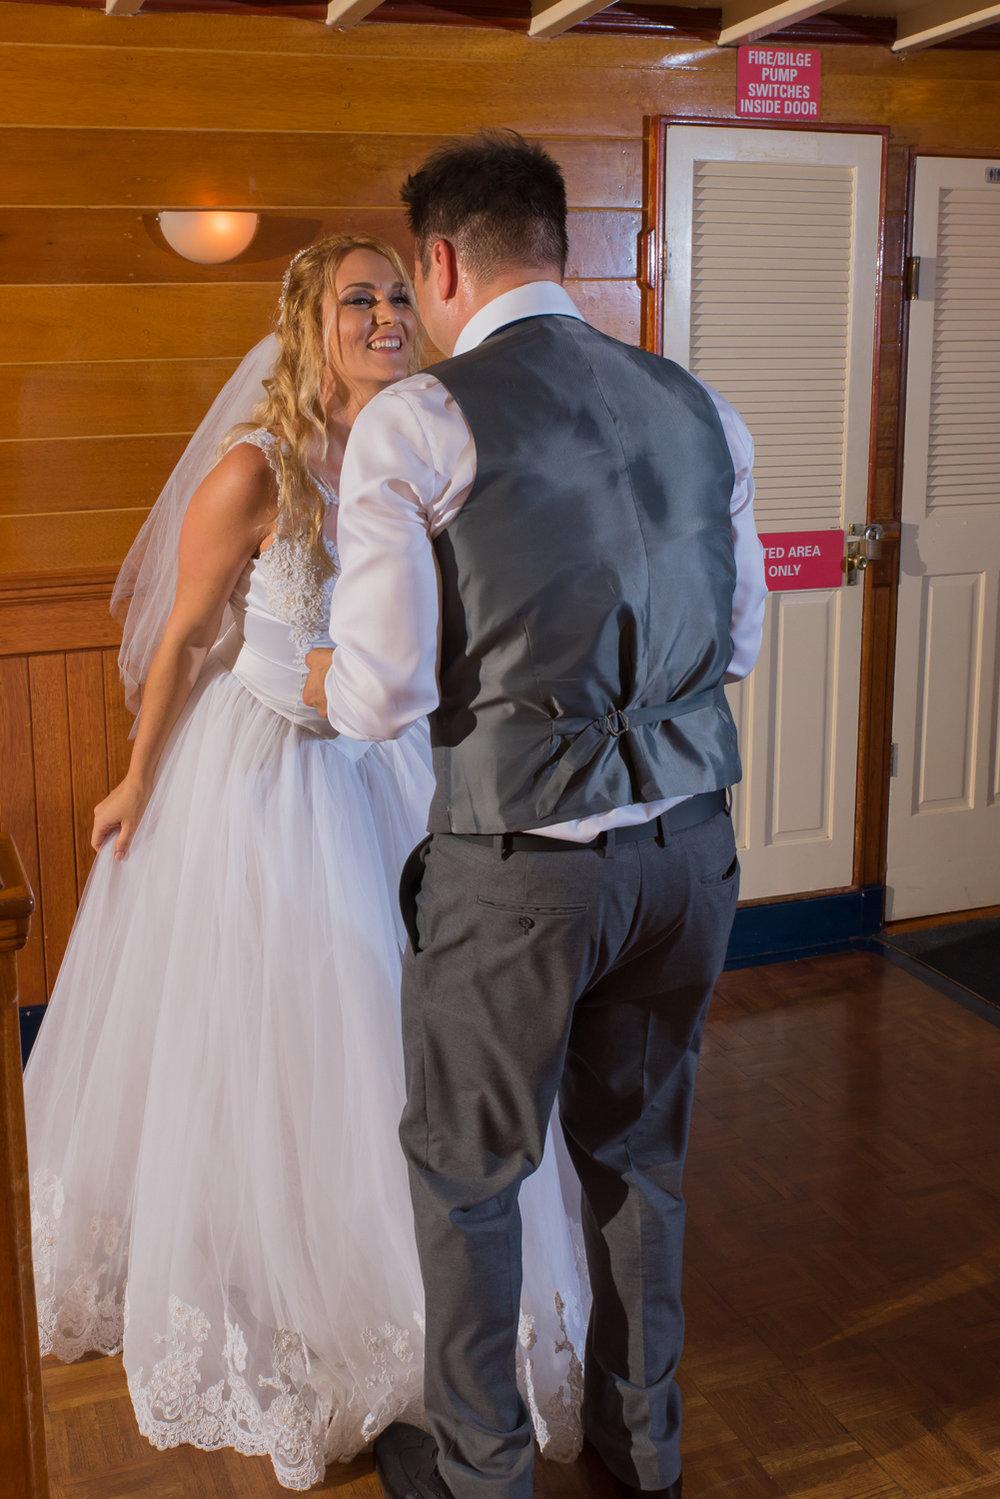 2016_September_04-nomad_lola_wedding_secondshooter-28022.jpg